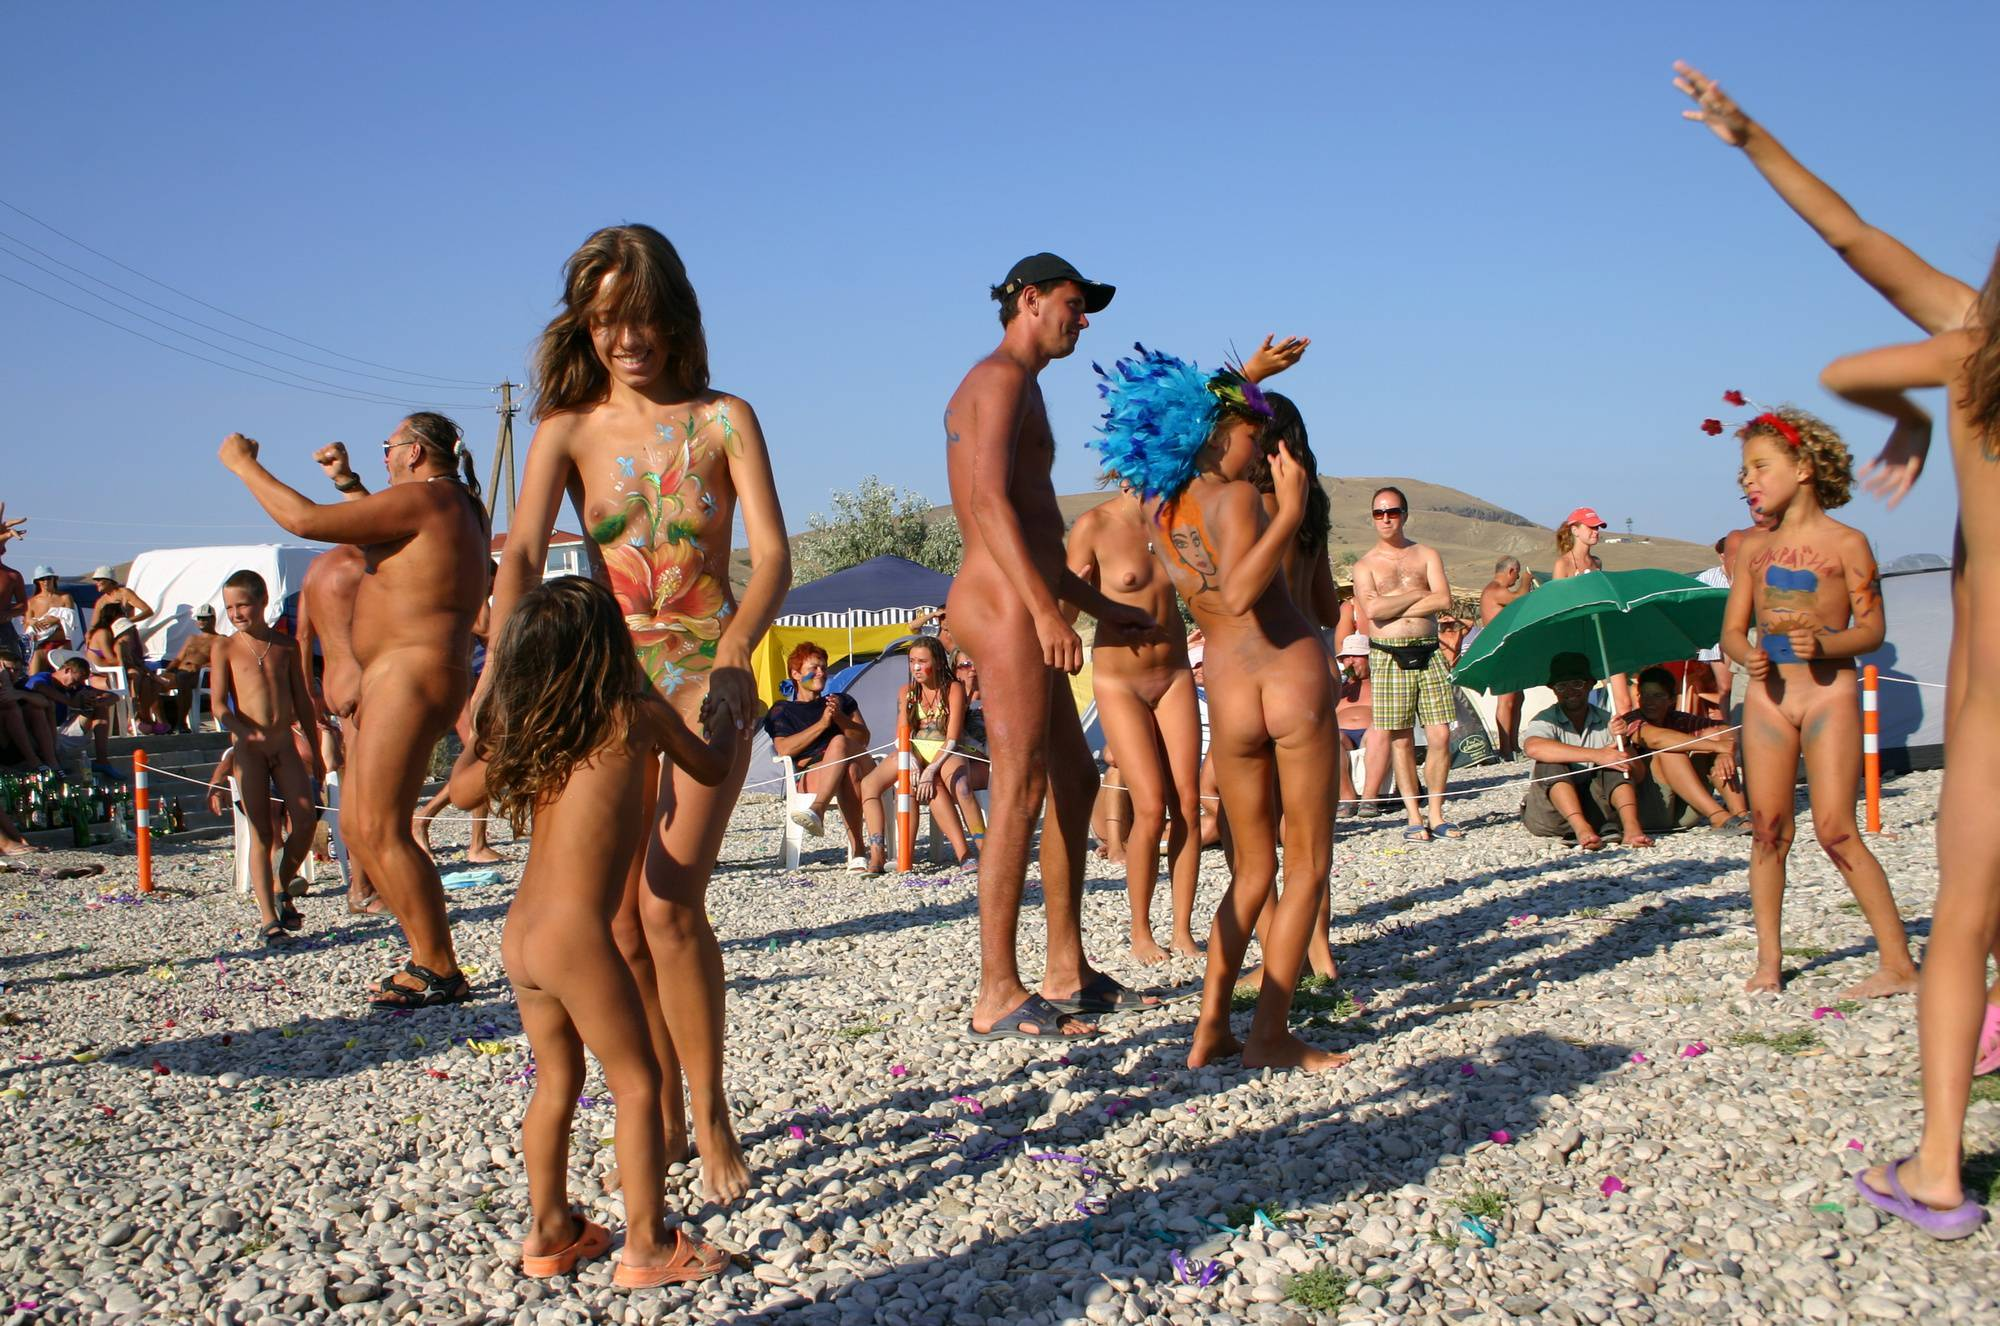 Purenudism-Family Beach Dance Party - 1